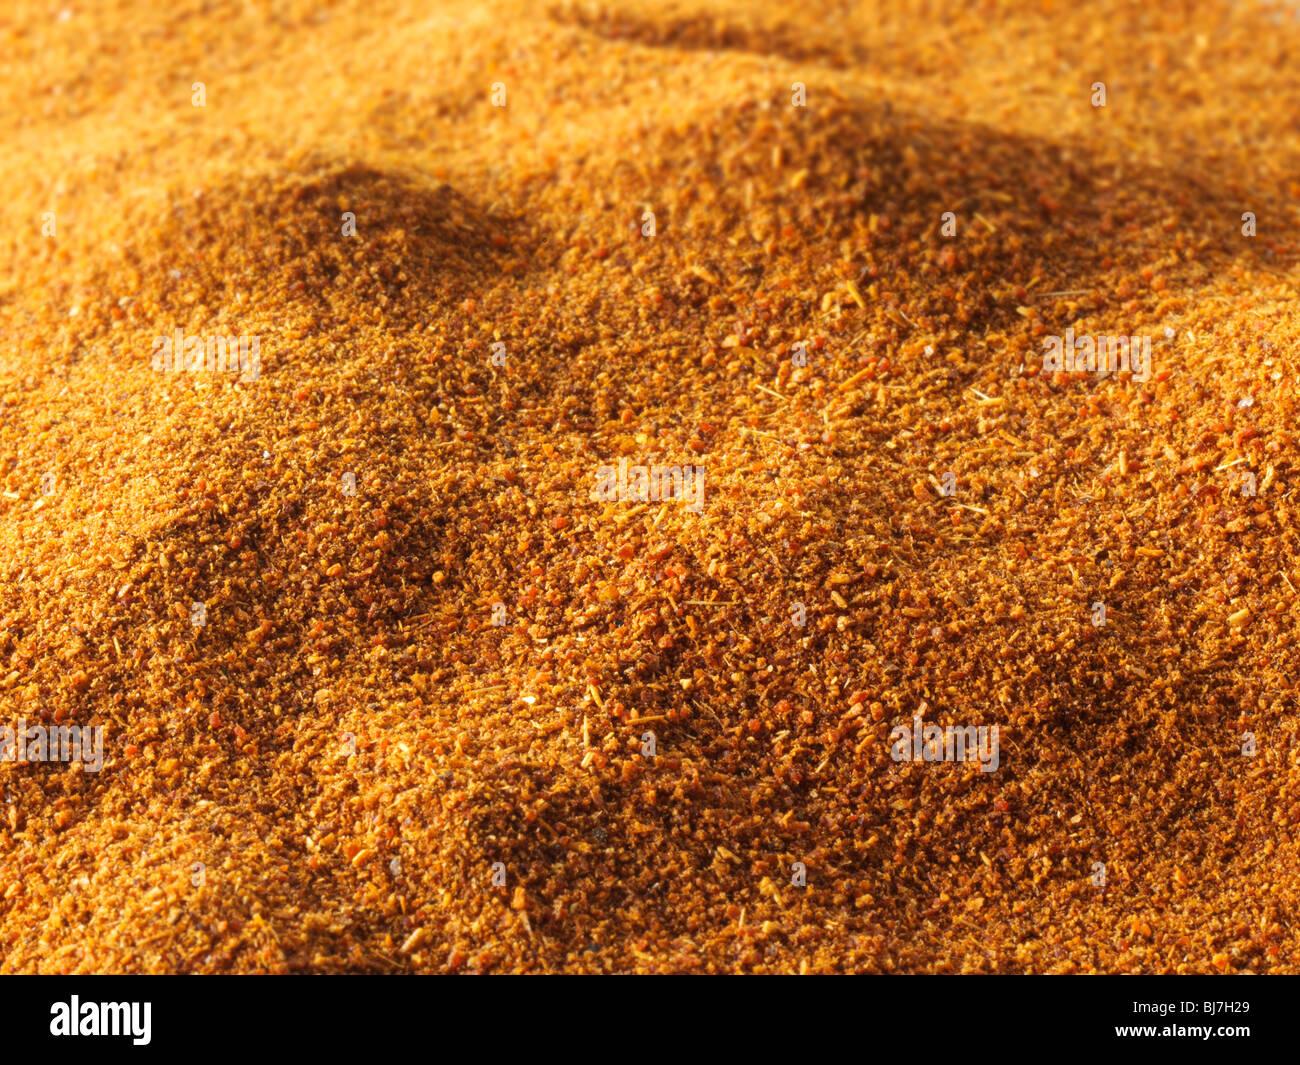 Tierra de chili en polvo , cerrar full frame Foto de stock